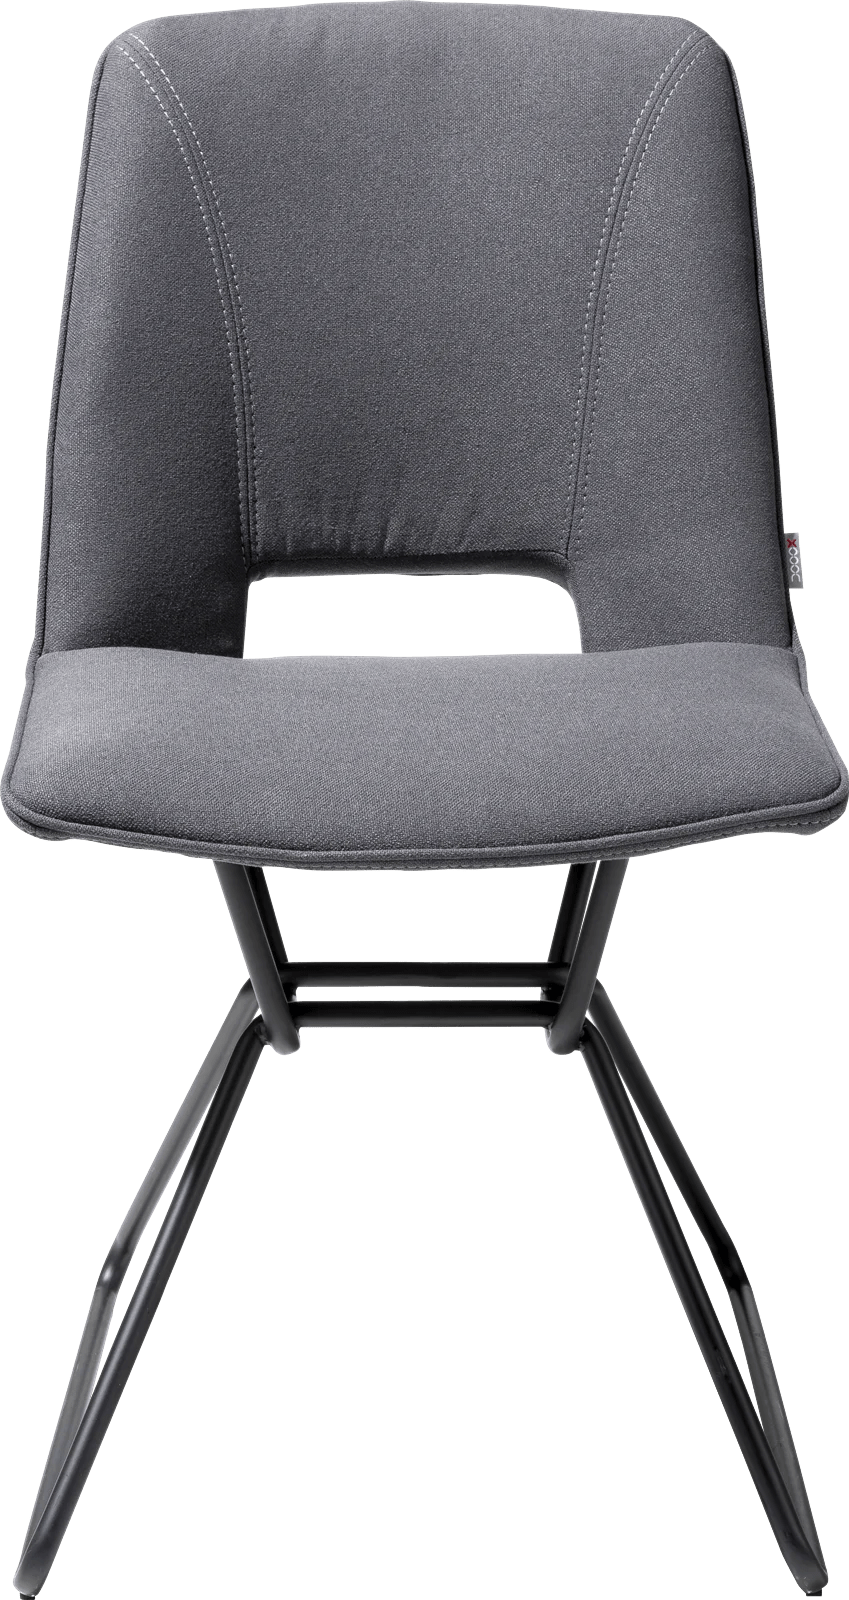 matiz chaise cadre noir tissu lana